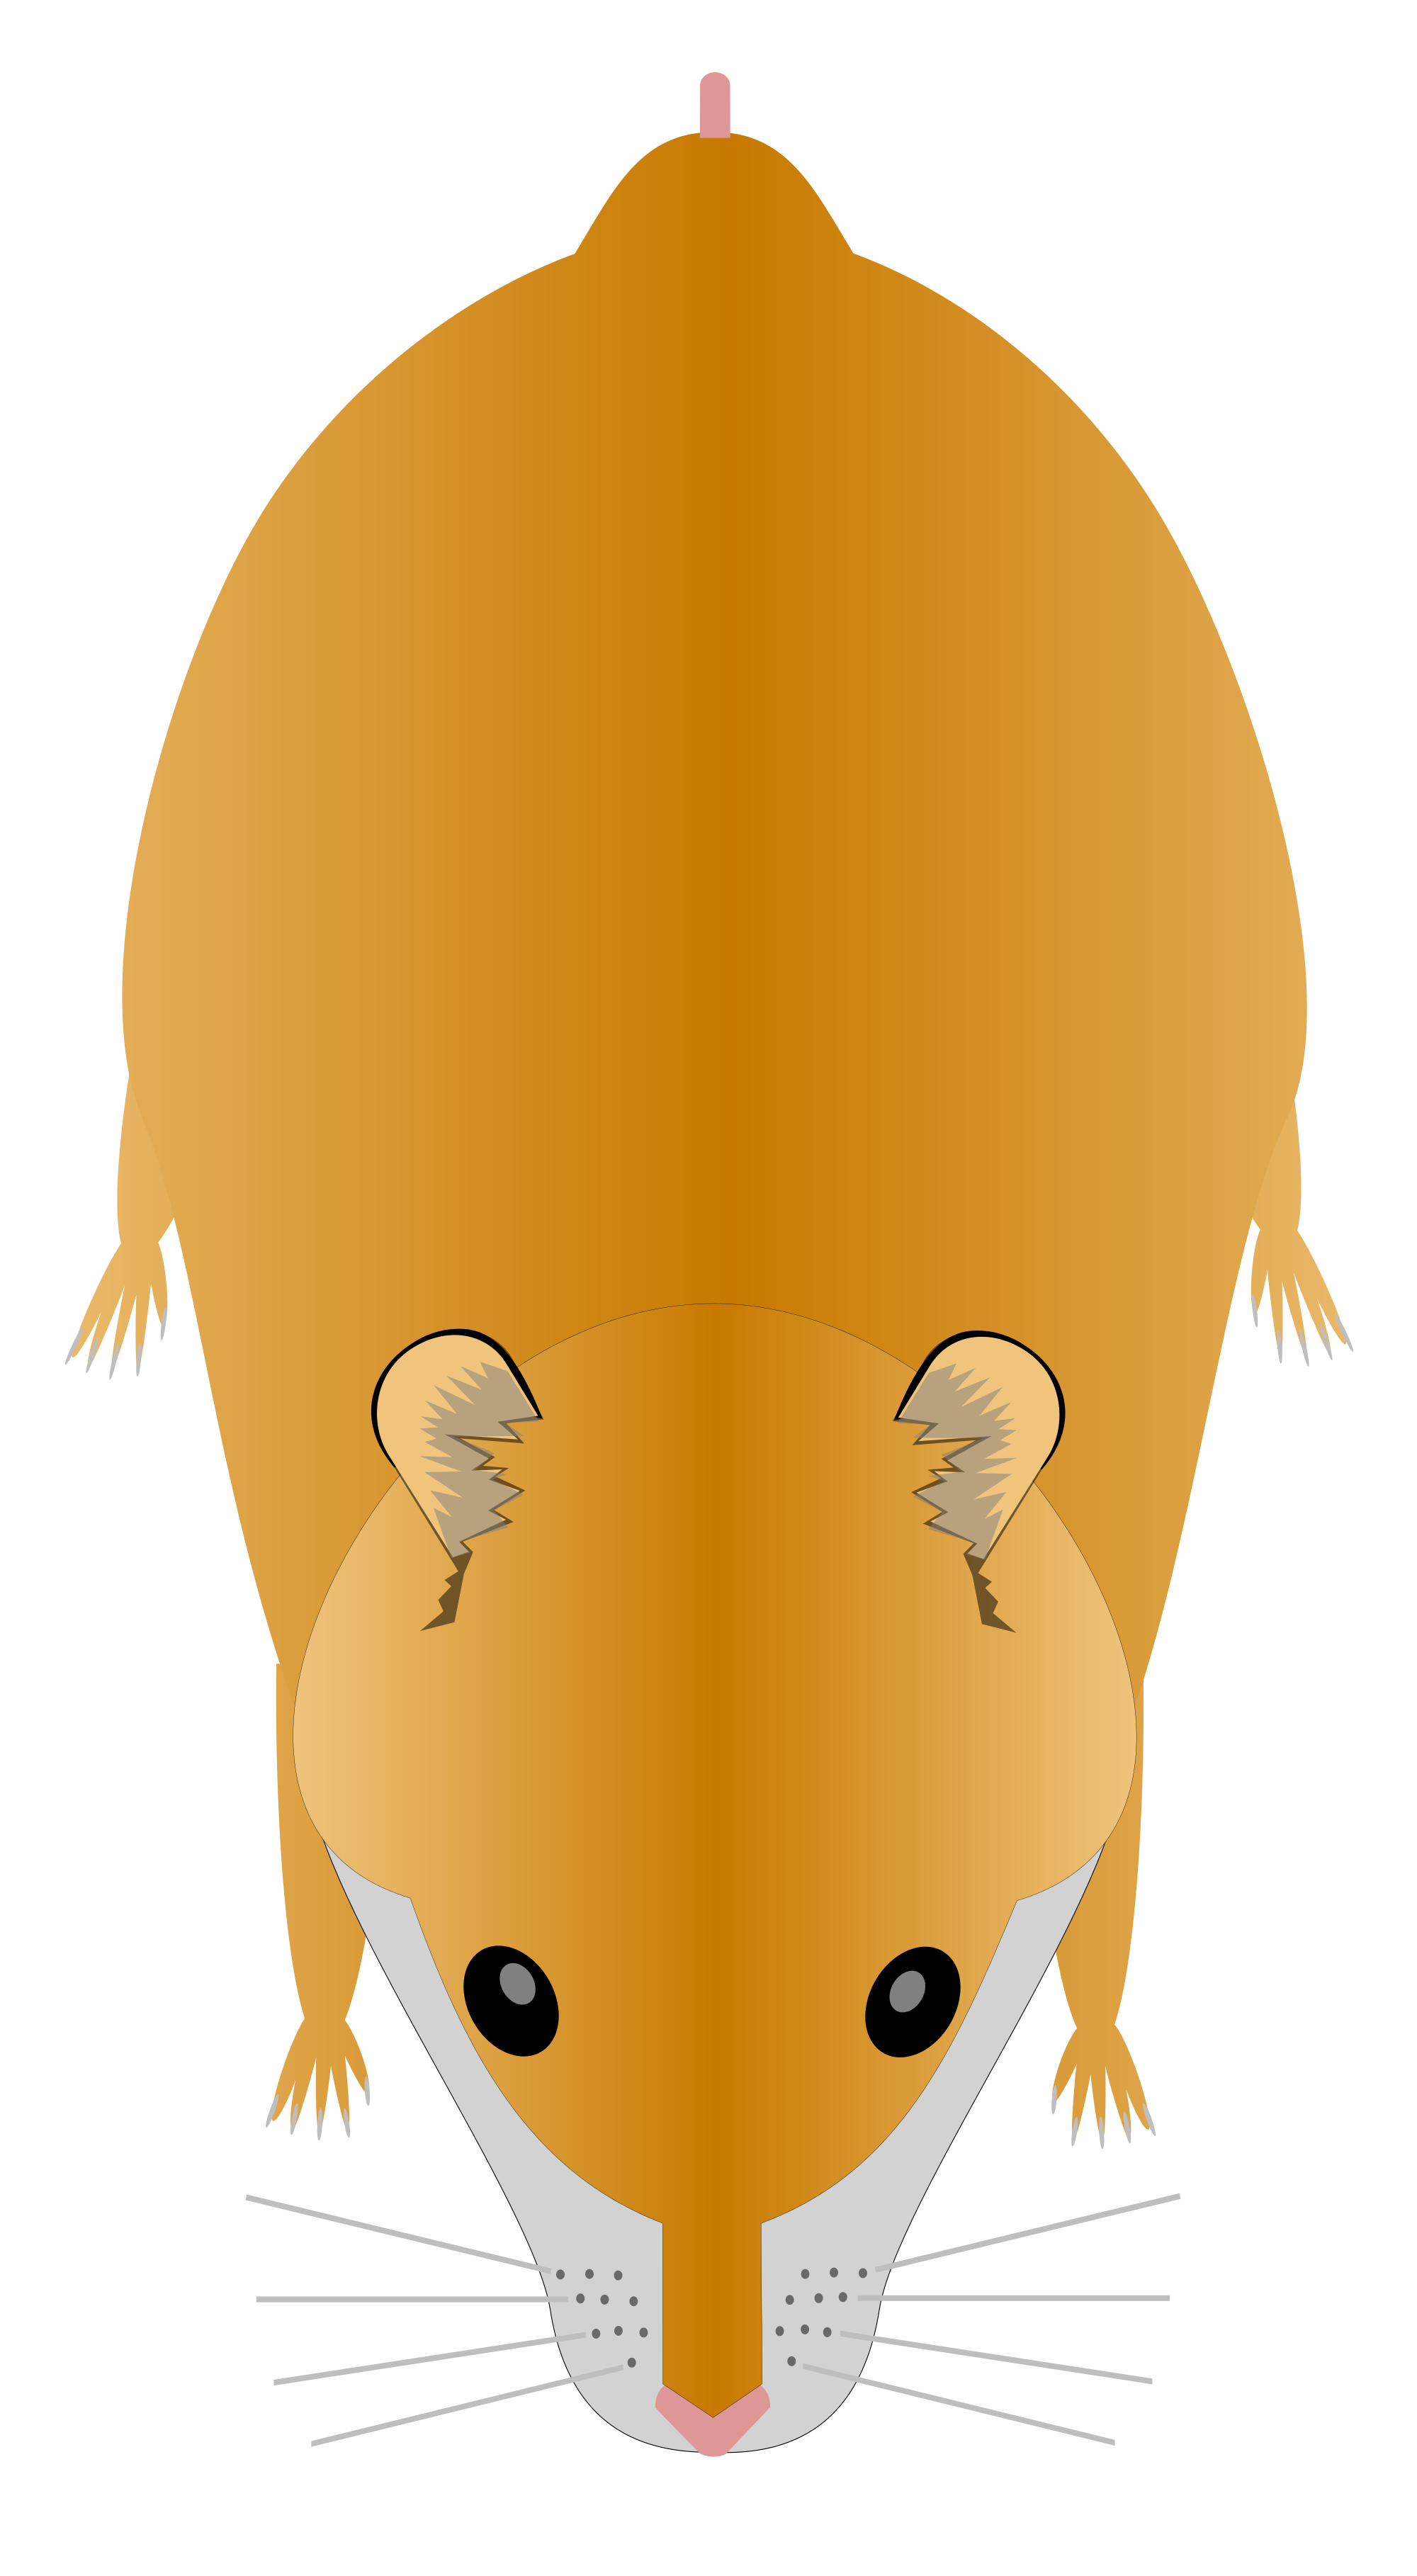 Hamster svg #8, Download drawings